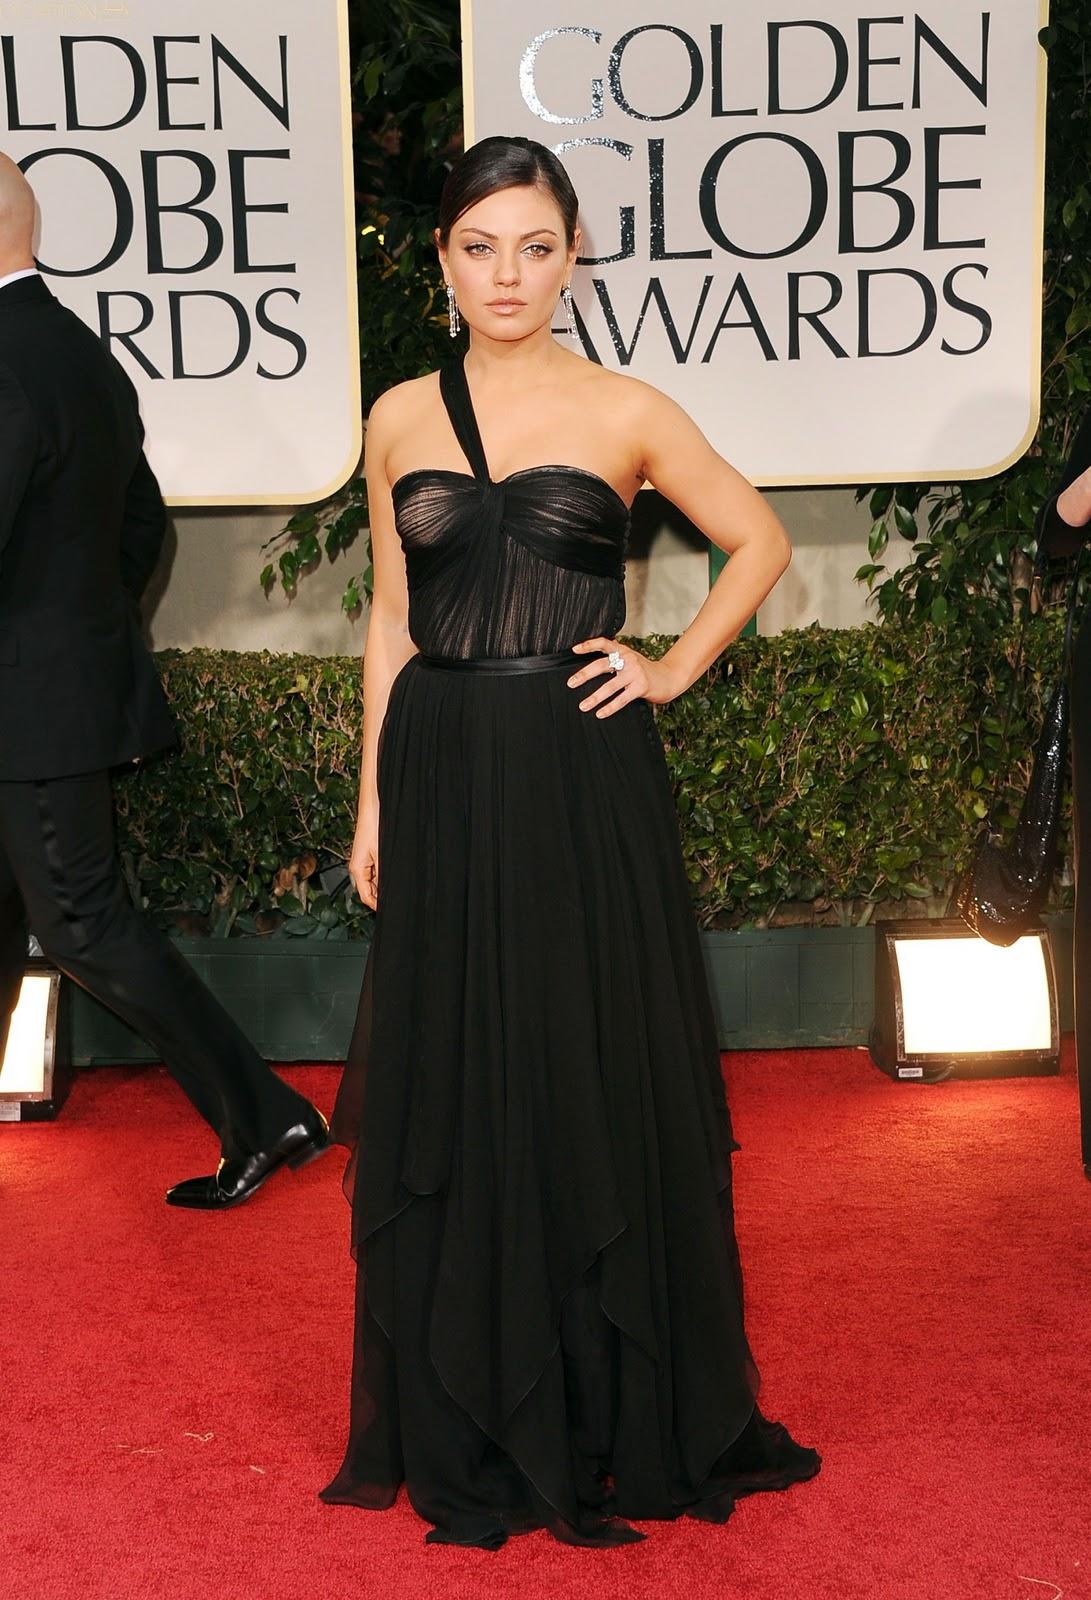 http://3.bp.blogspot.com/-oqrIIVqXAio/TxQhTKP0pdI/AAAAAAAAOYw/A4btk7xKusA/s1600/CU-Mila+Kunis+arrives+at+the+69th+Annual+Golden+Globe+Awards-01.jpg